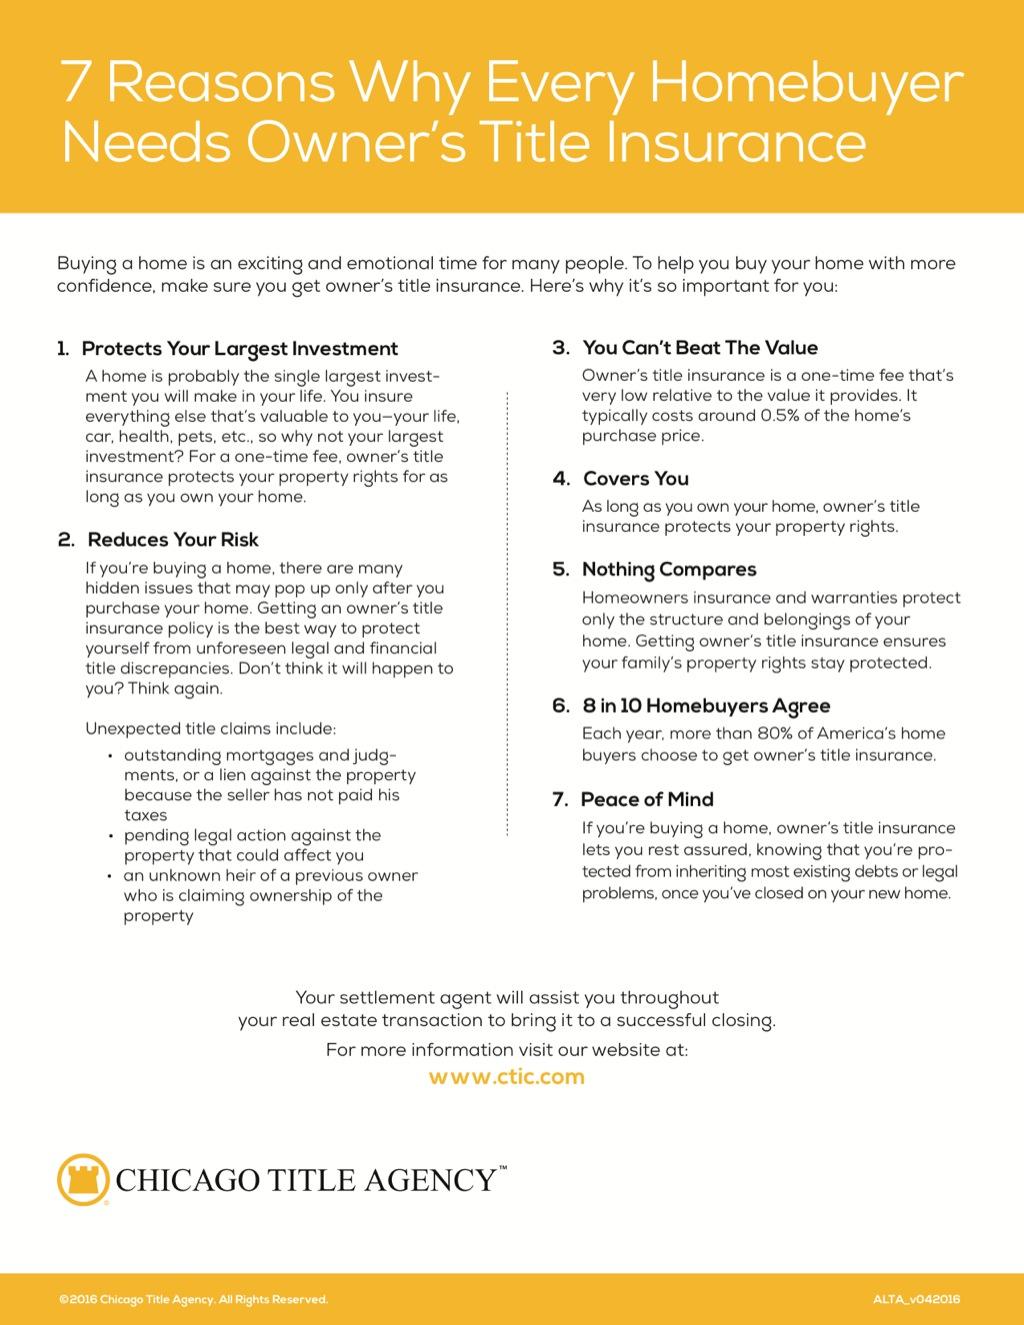 Corefact 7 Reasons why - CTA